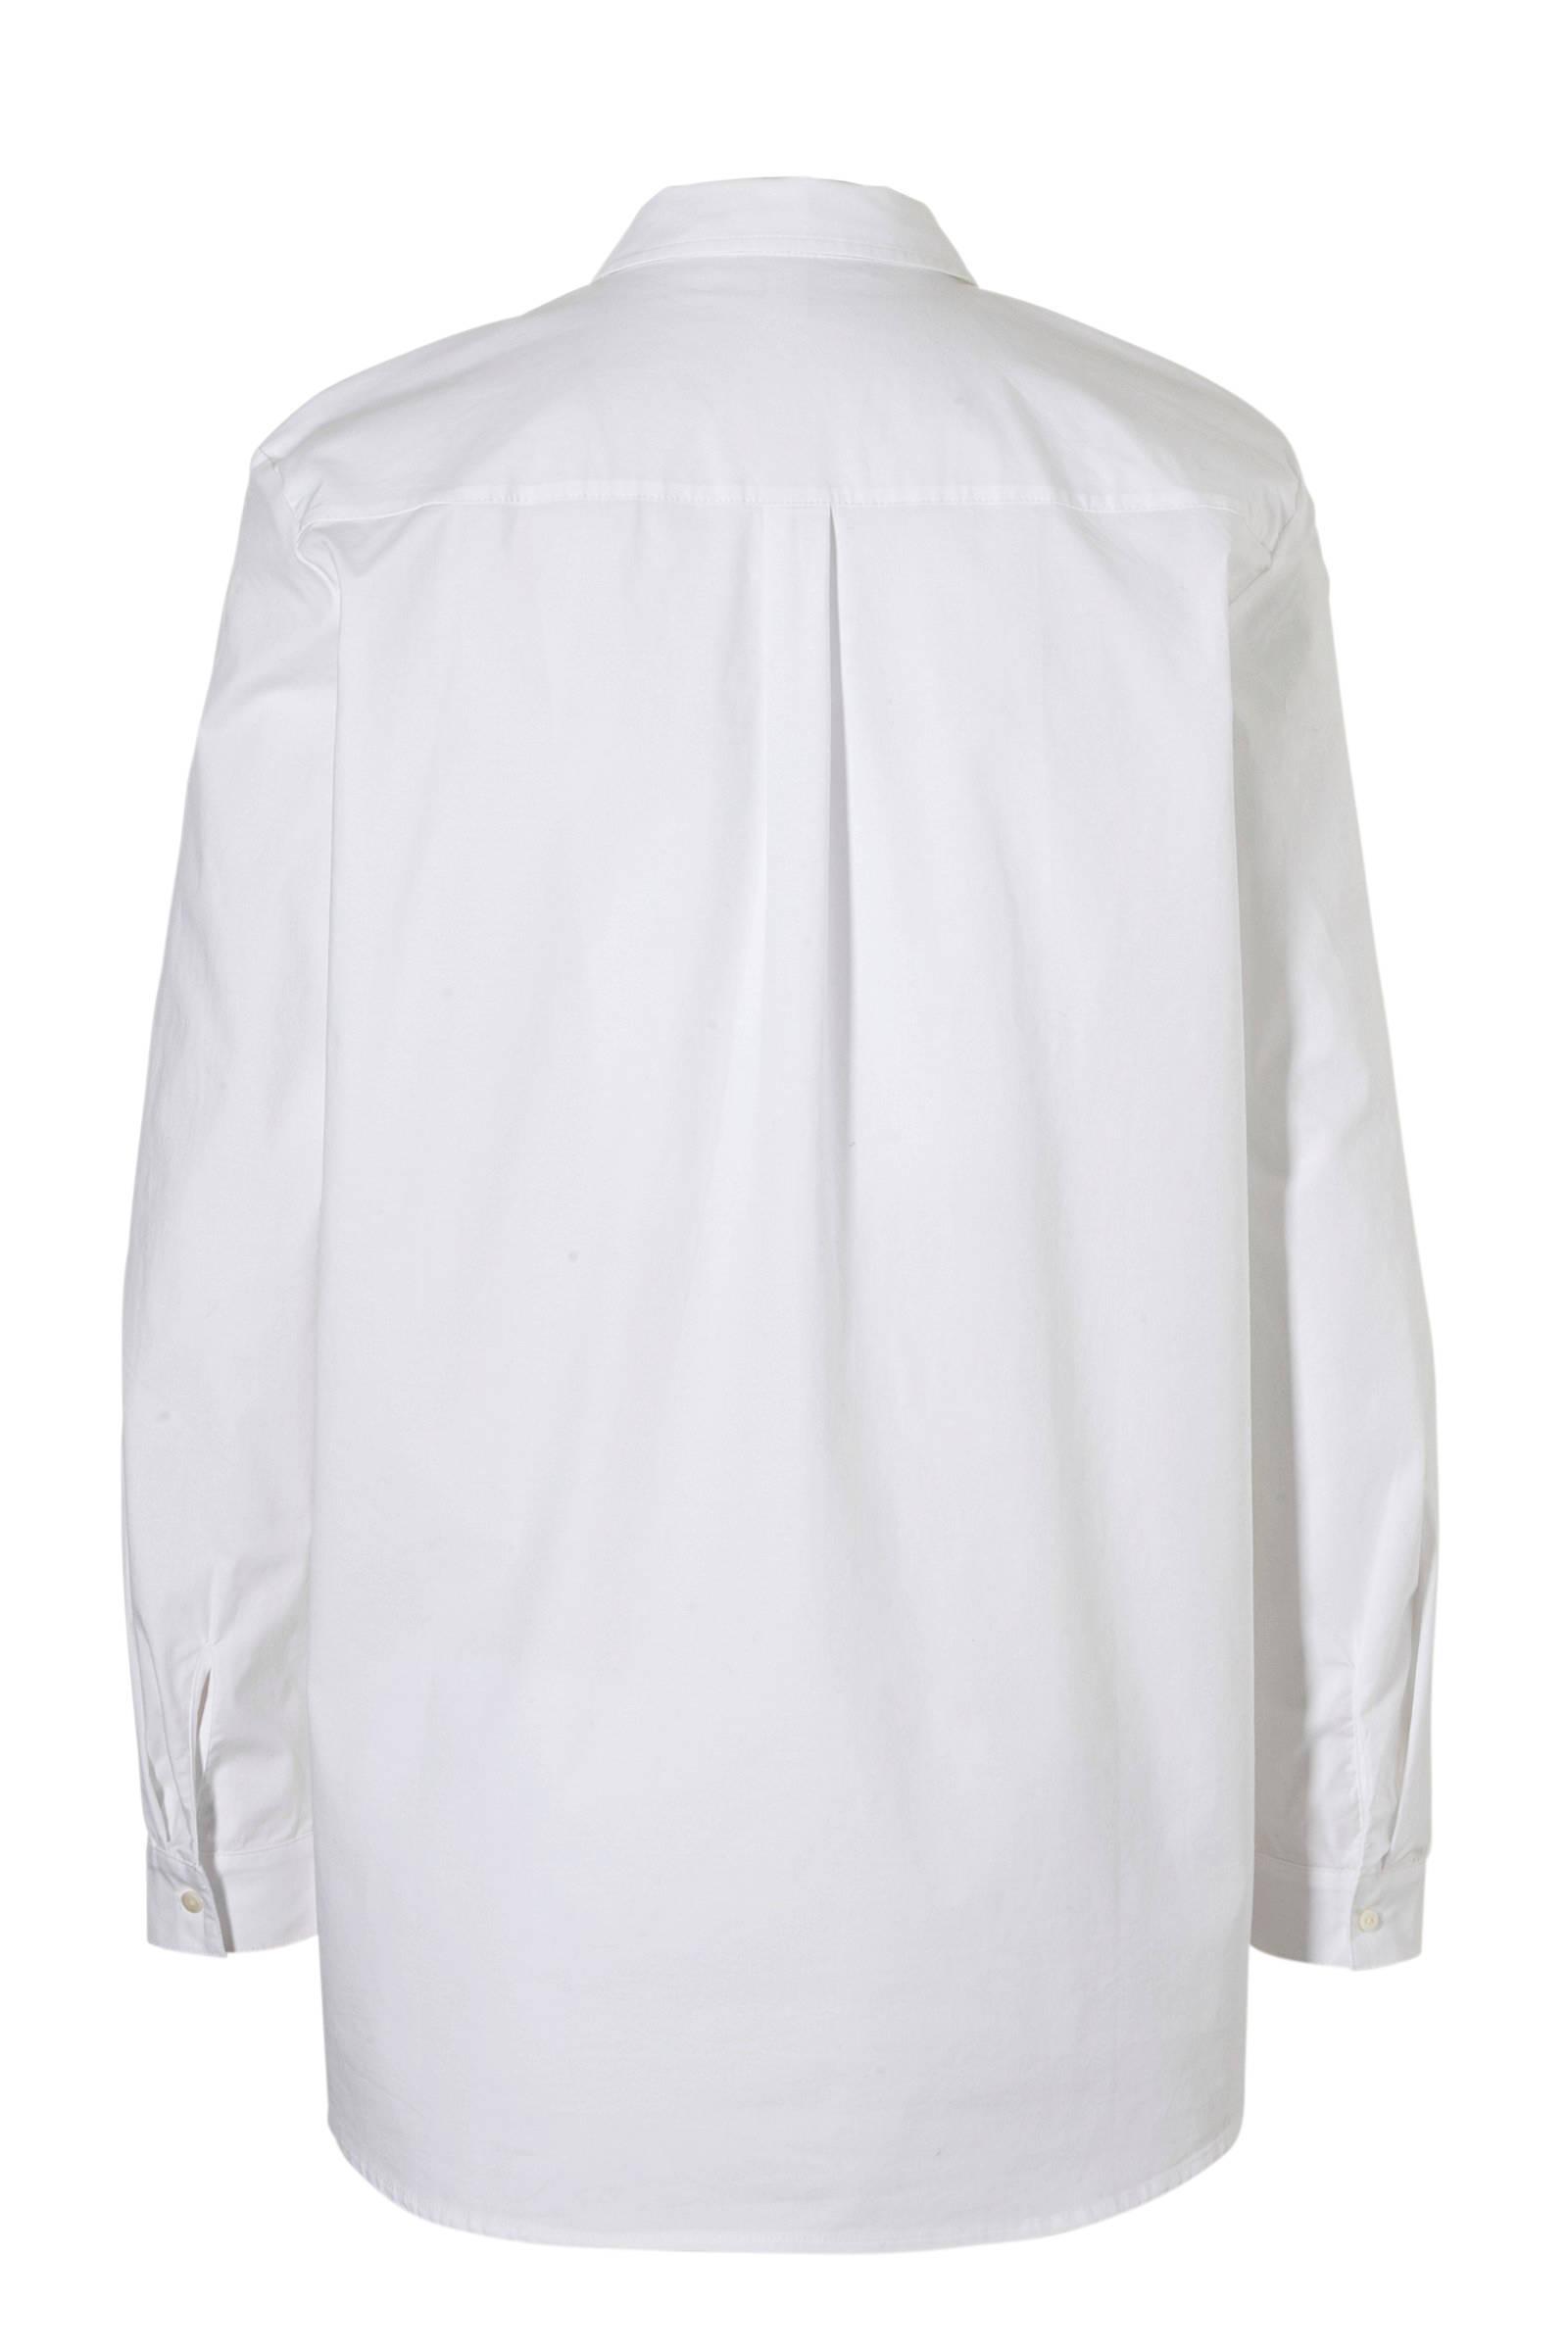 wit ESPRIT Women Women blouse Casual ESPRIT 8zxZqwz